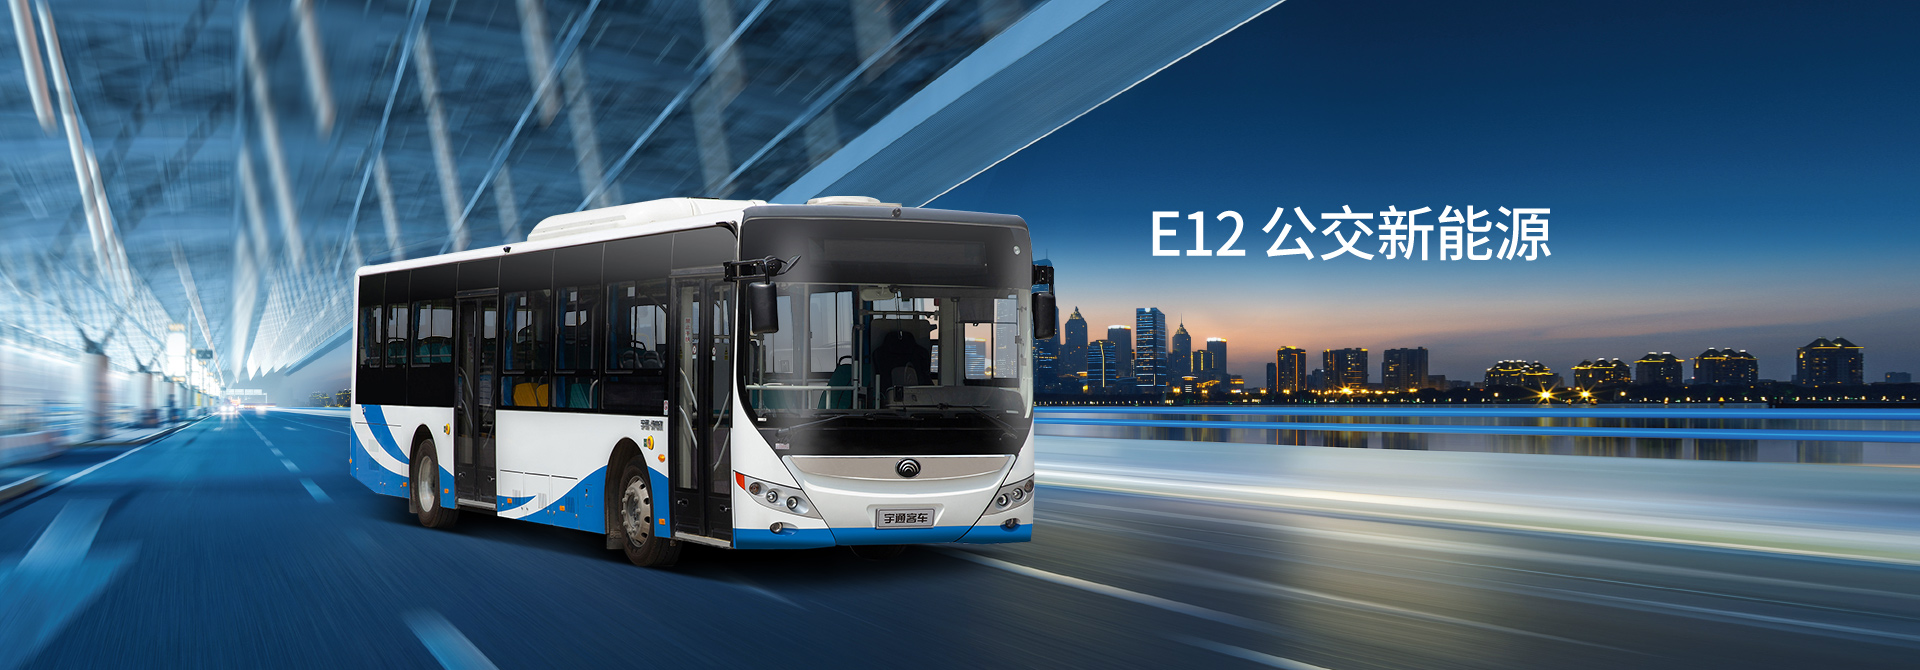 5-E12公交新能源